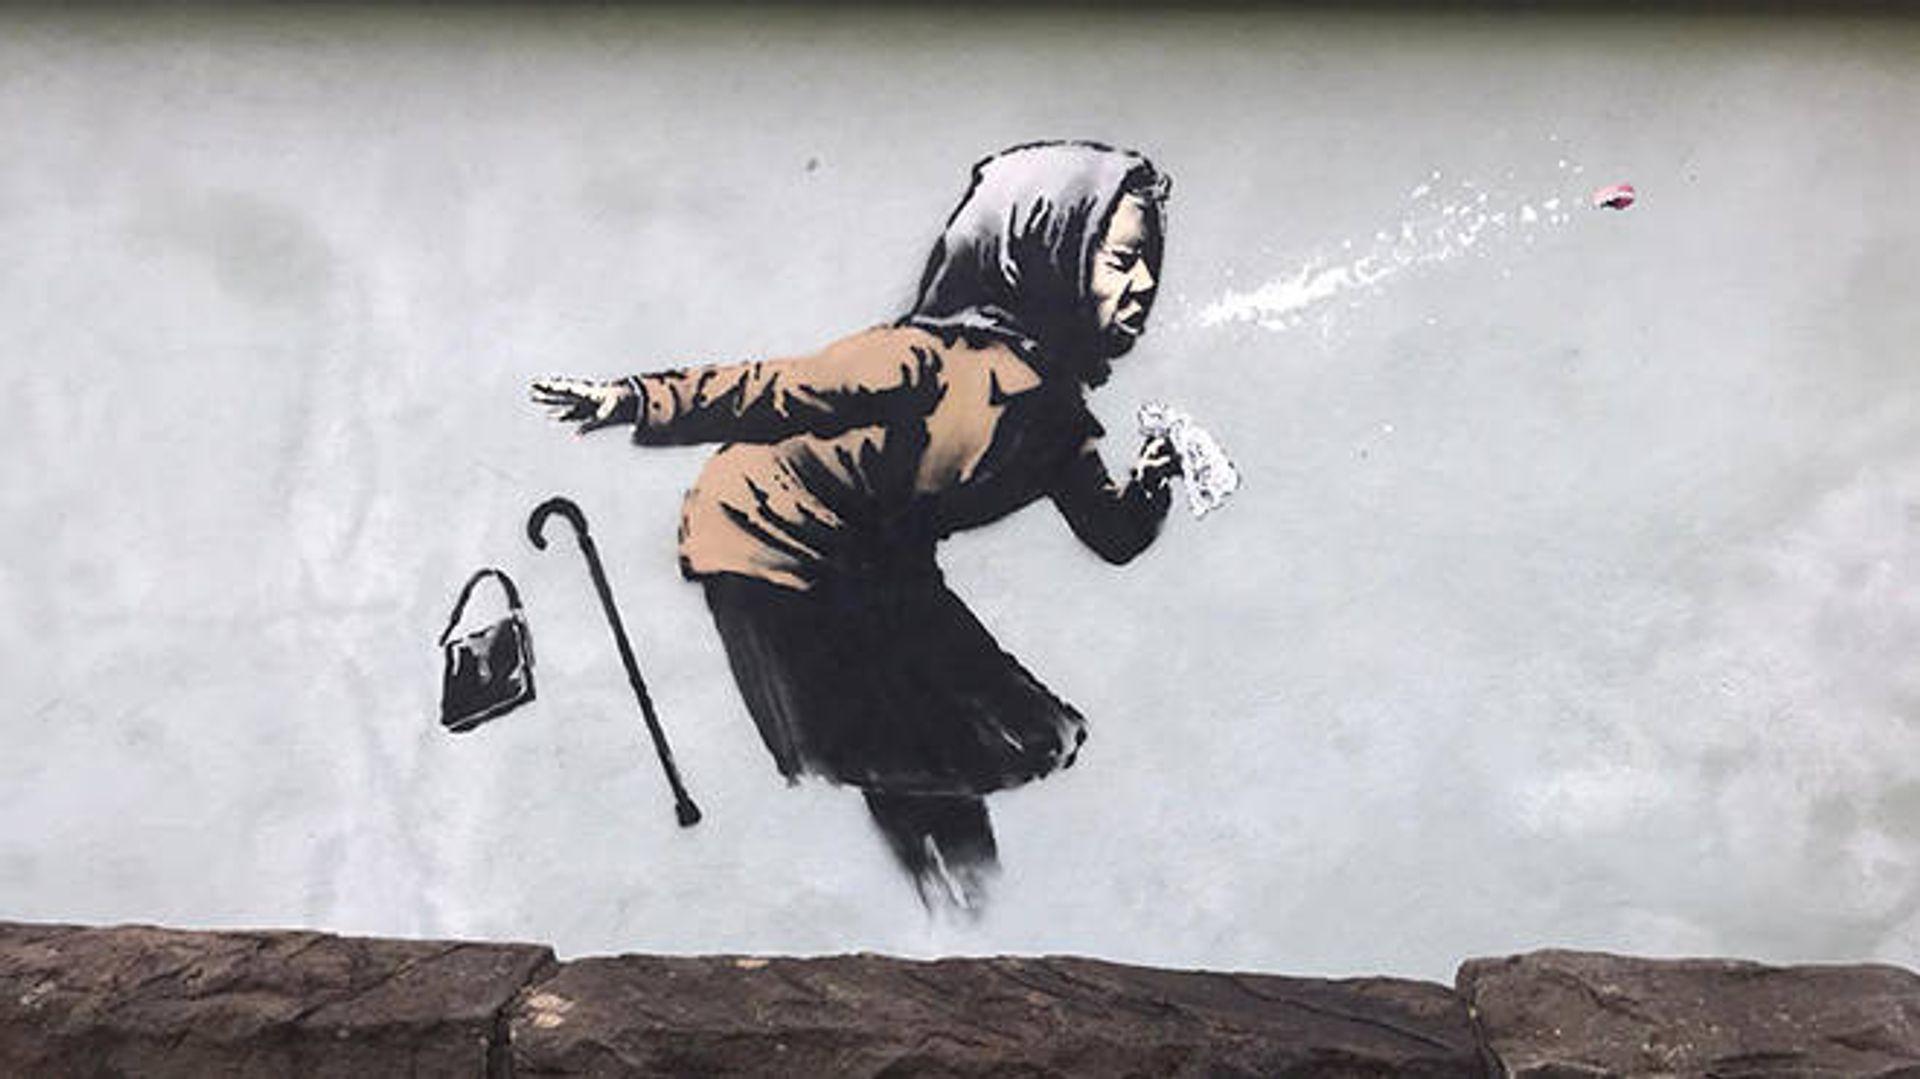 Banksy's Aachoo!! (2020) appeared on a house in Bristol earlier this week © Sam Cook